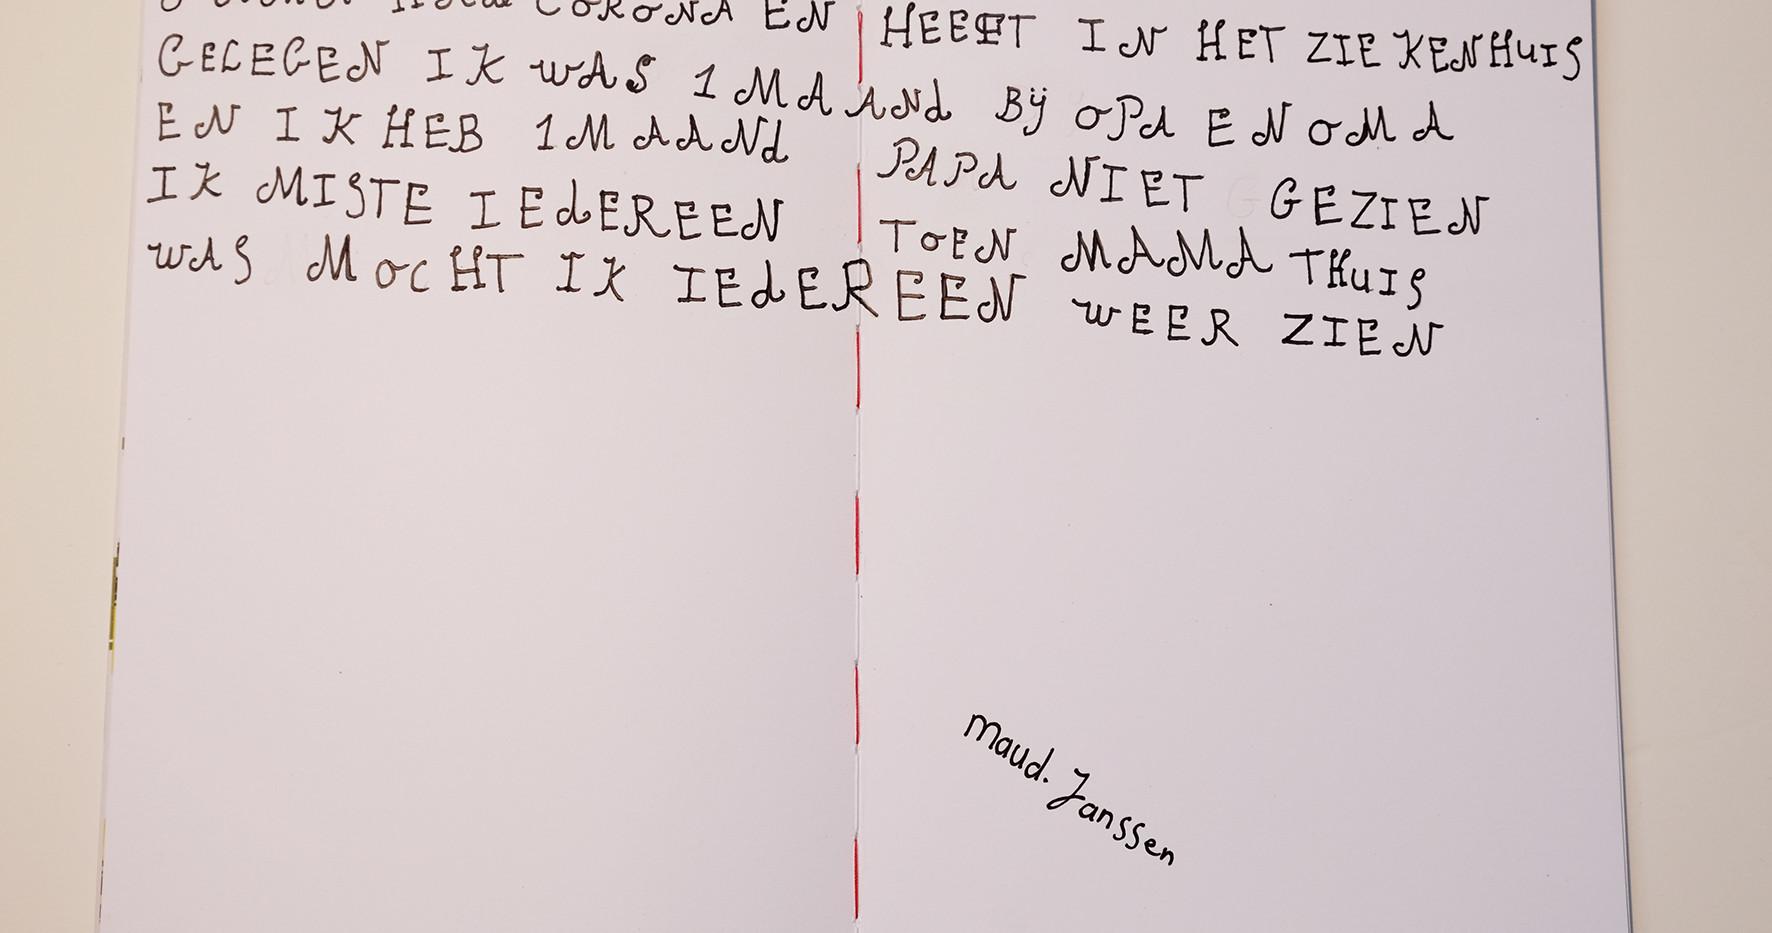 001 Maud Janssen TK1E.JPG